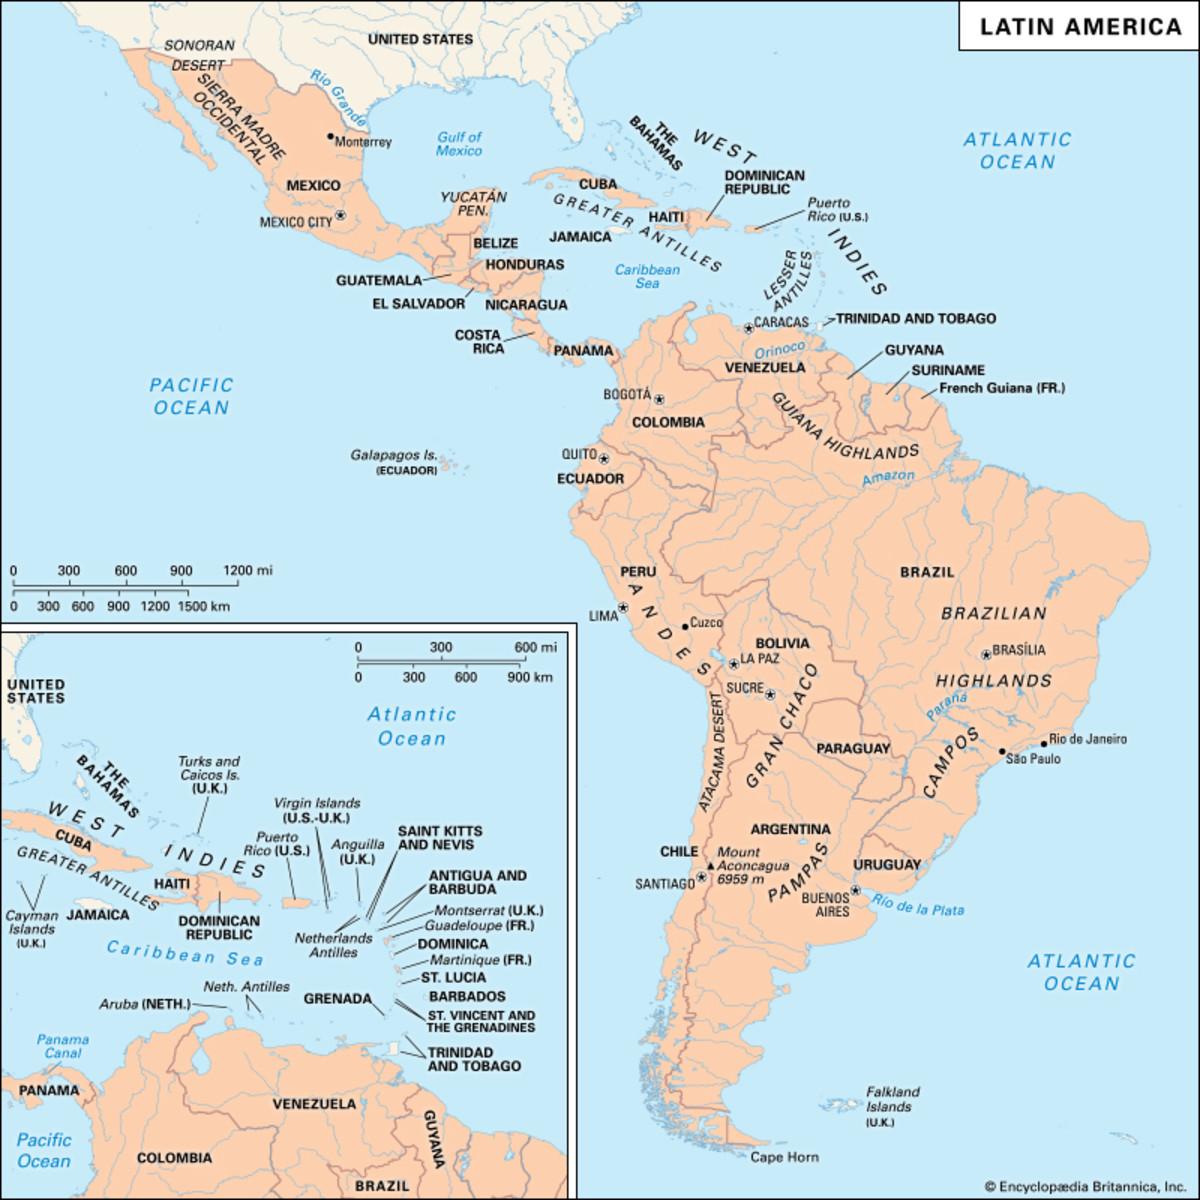 Latin American Neutrality During World War One